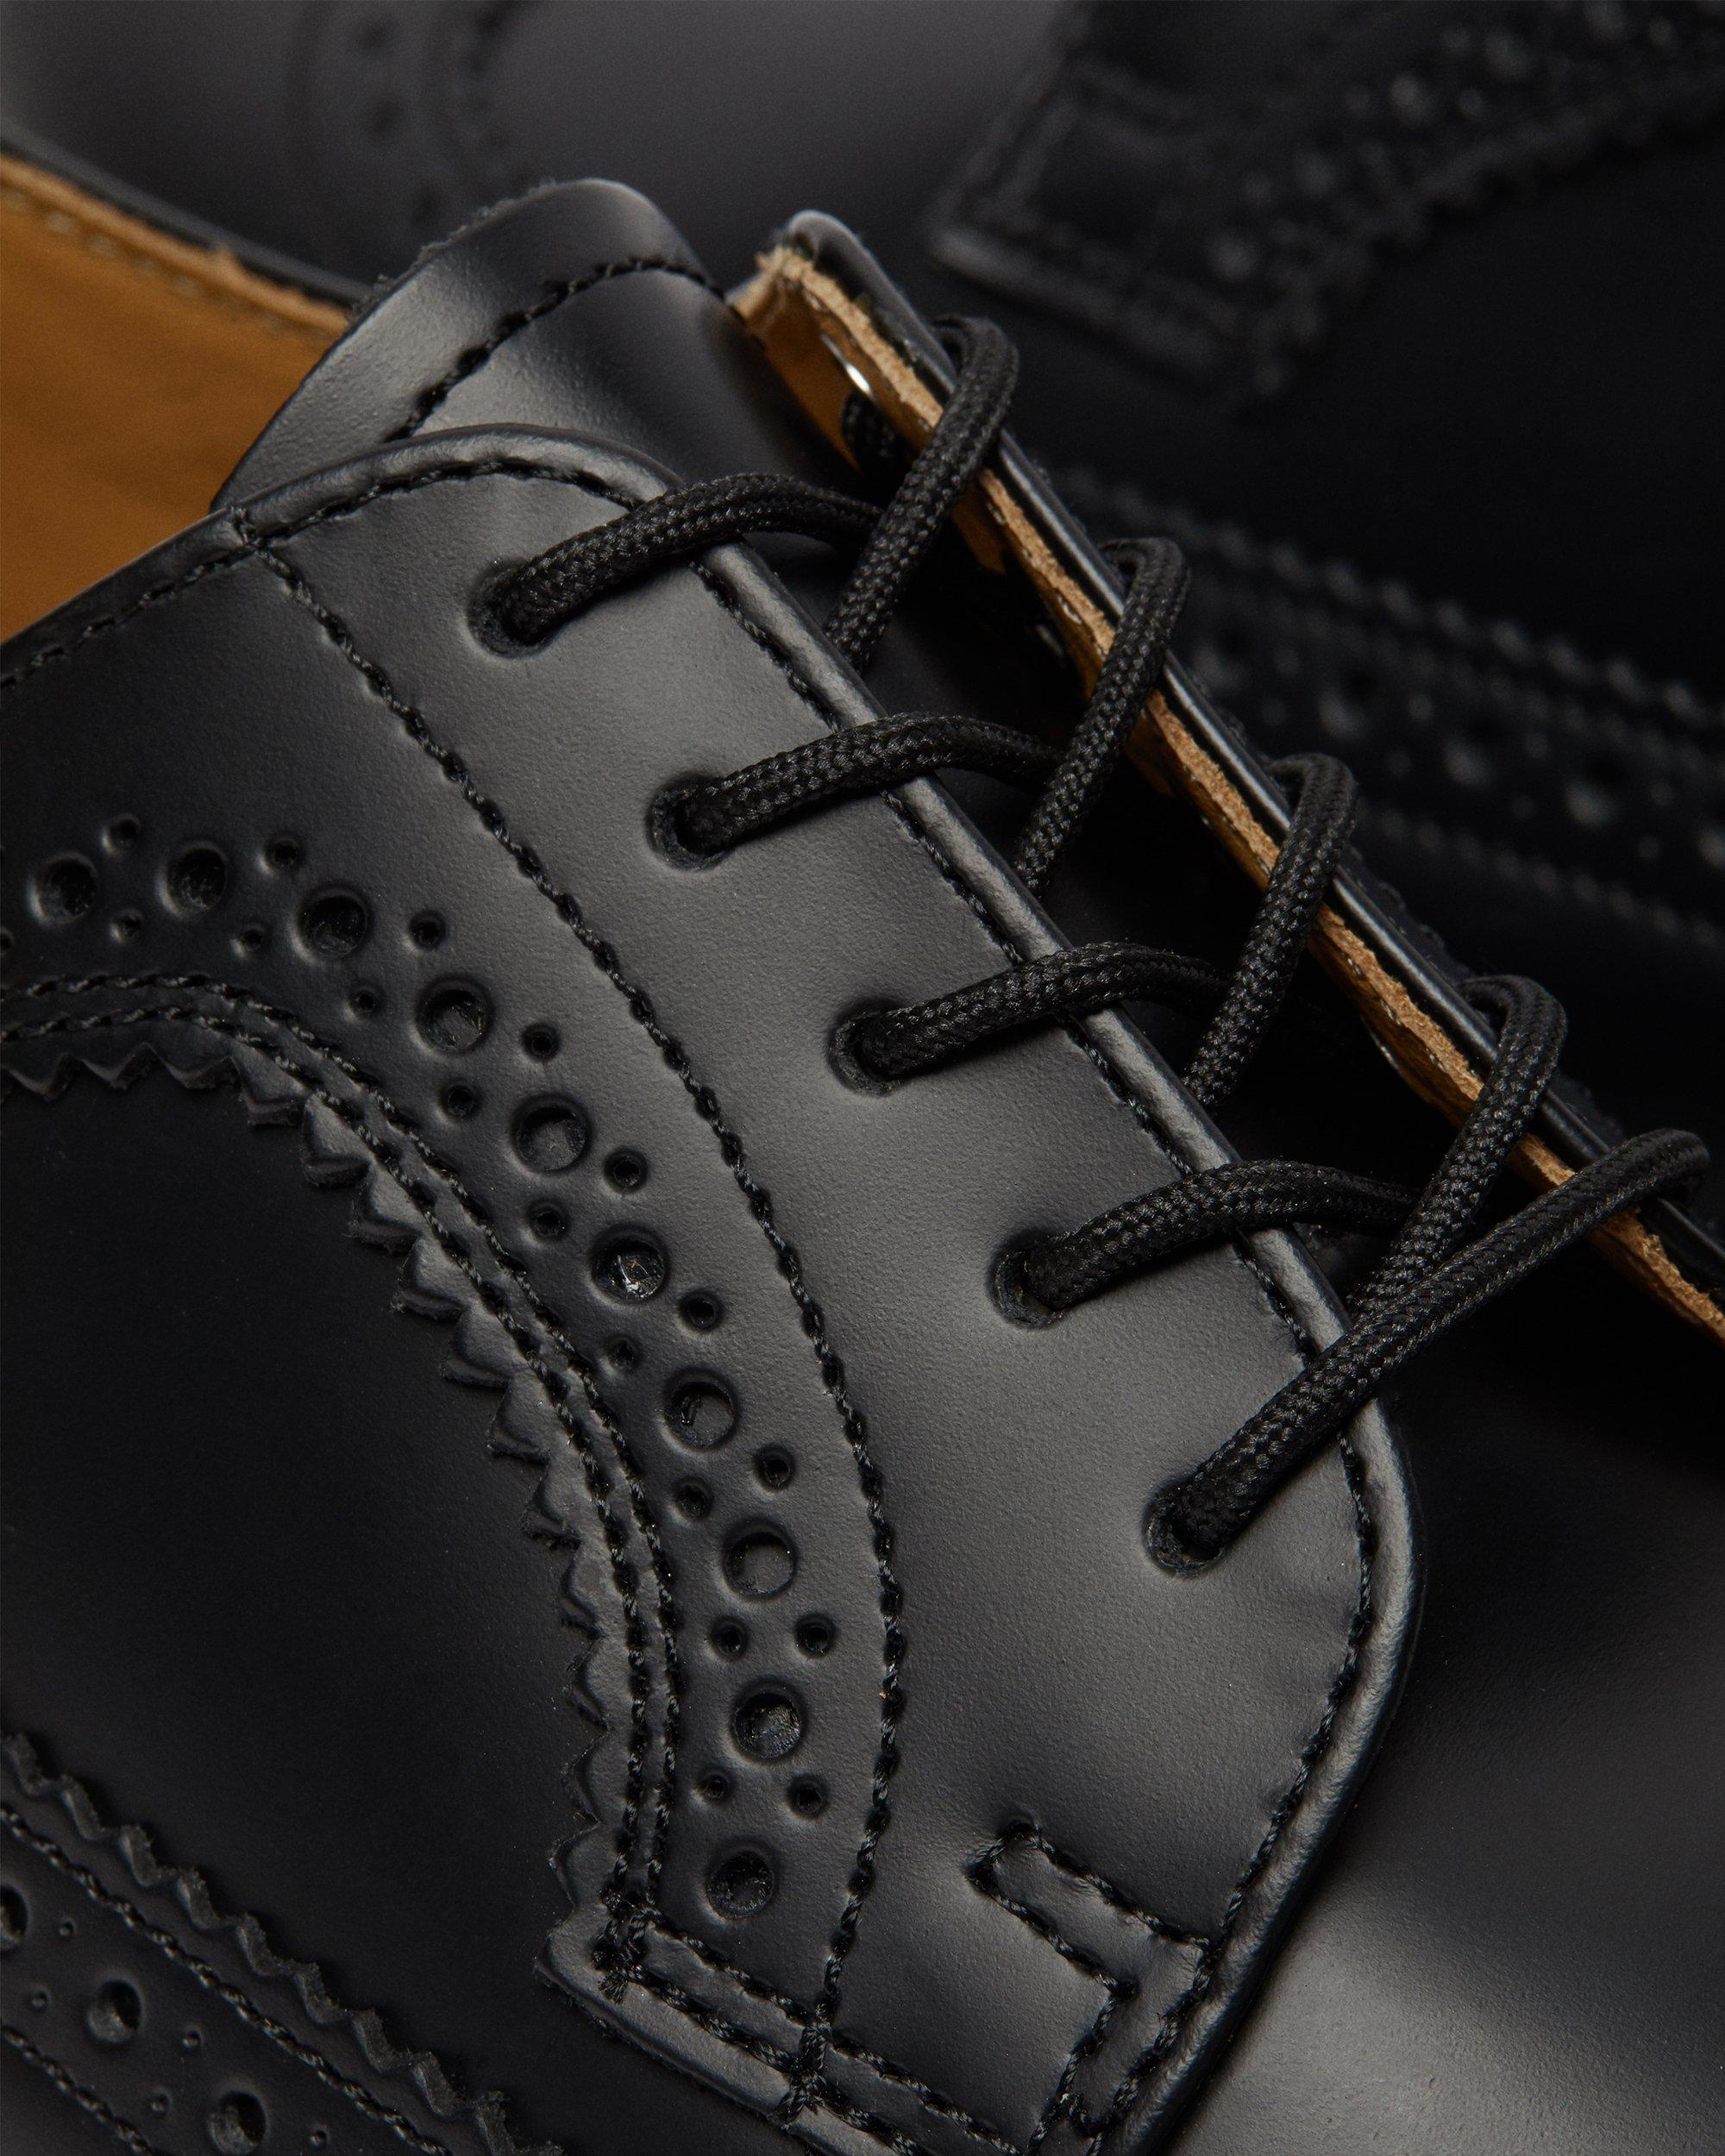 Chaussures Homme | Chaussures en Cuir, Toile & Vegan | Dr